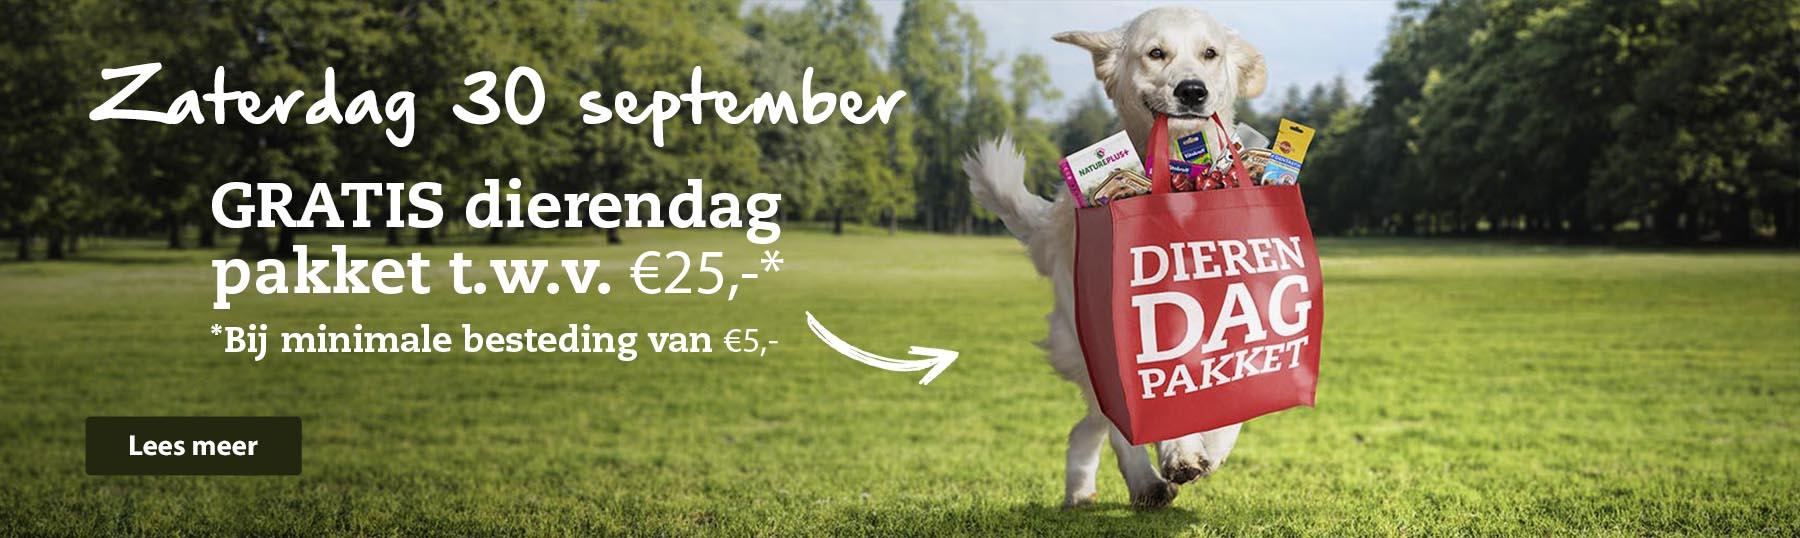 (Gratis) dierendagpakket bbv €5.00 @ Boerenbond/Pets Place